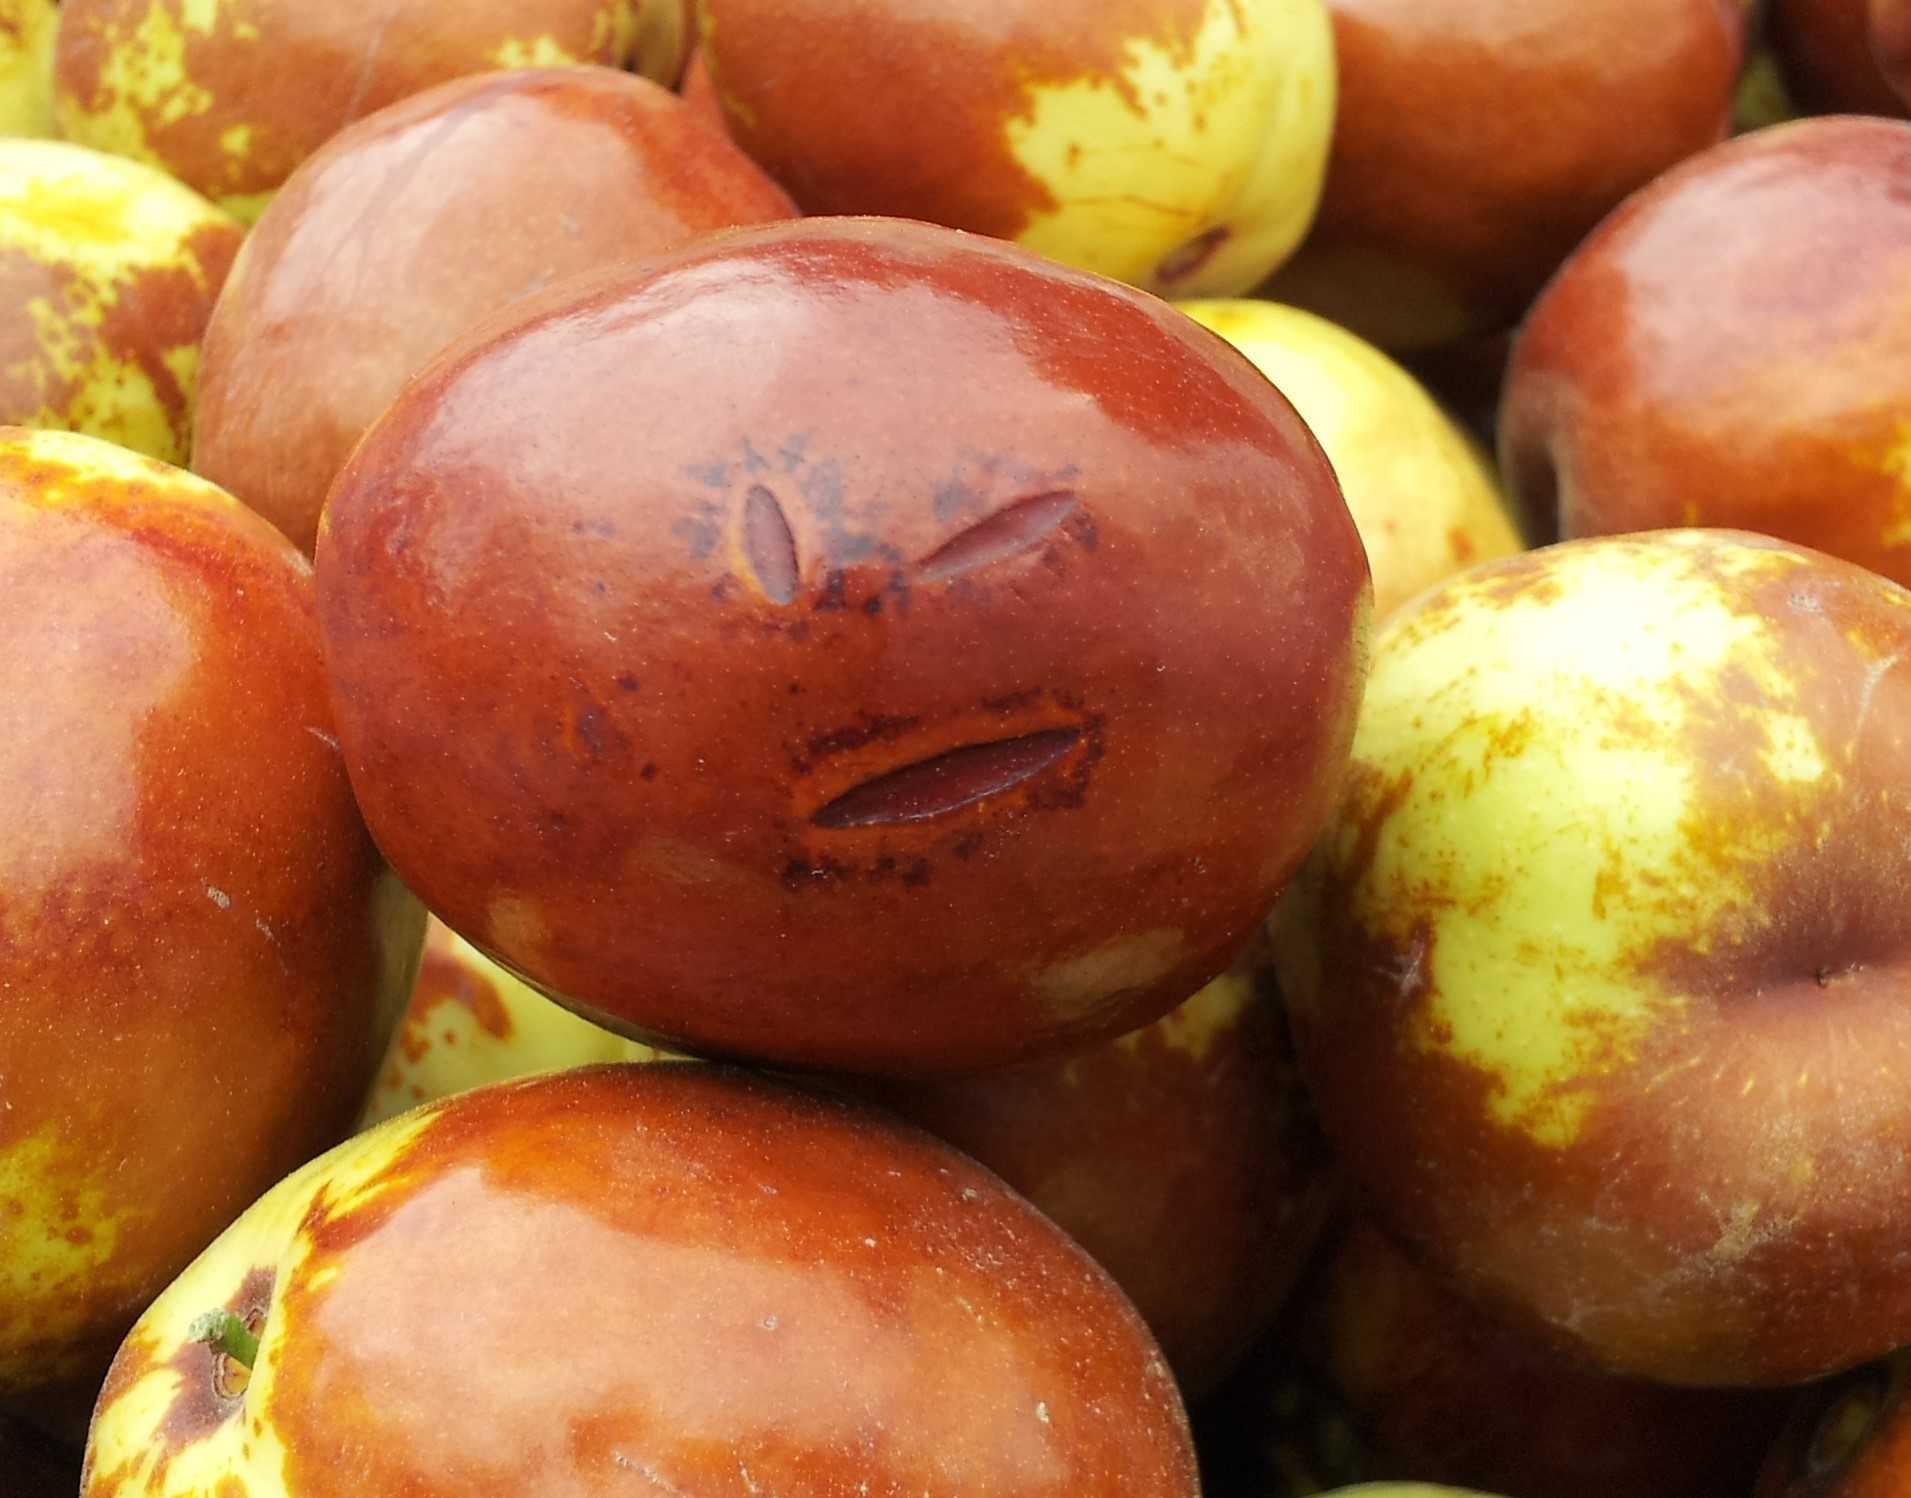 Finn the jujube fruit